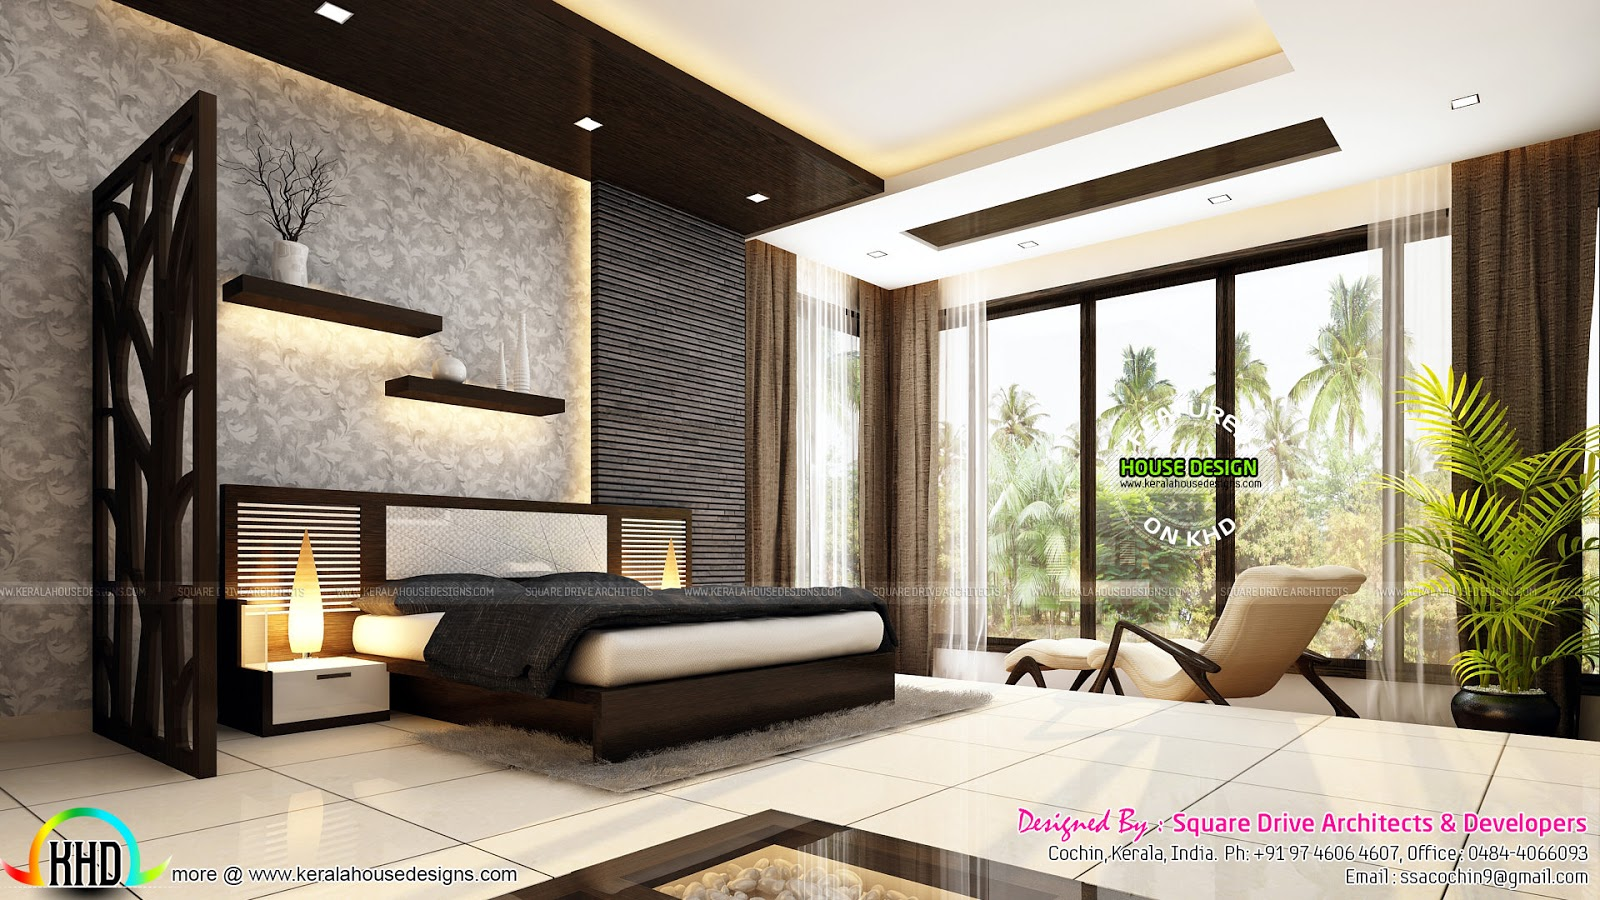 Very beautiful modern interior designs Kerala home design and ...